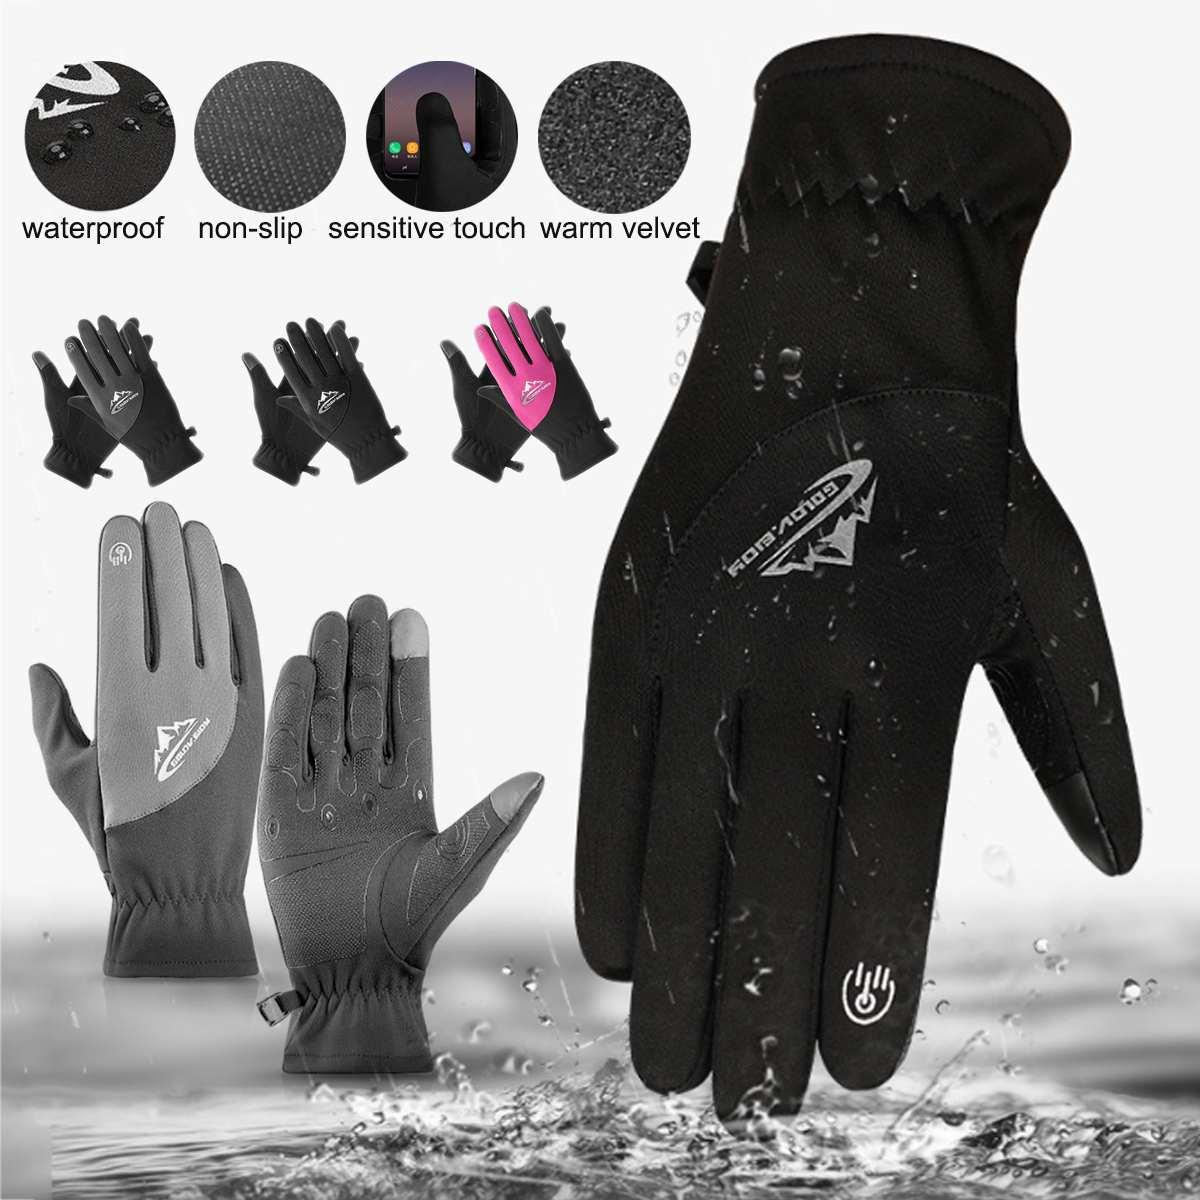 Thermal Ski Gloves Winter Fleece Waterproof Snowboard Gloves Snow Motorcycle Skiing Gloves Sportswear for Men Women Gloves miss booty